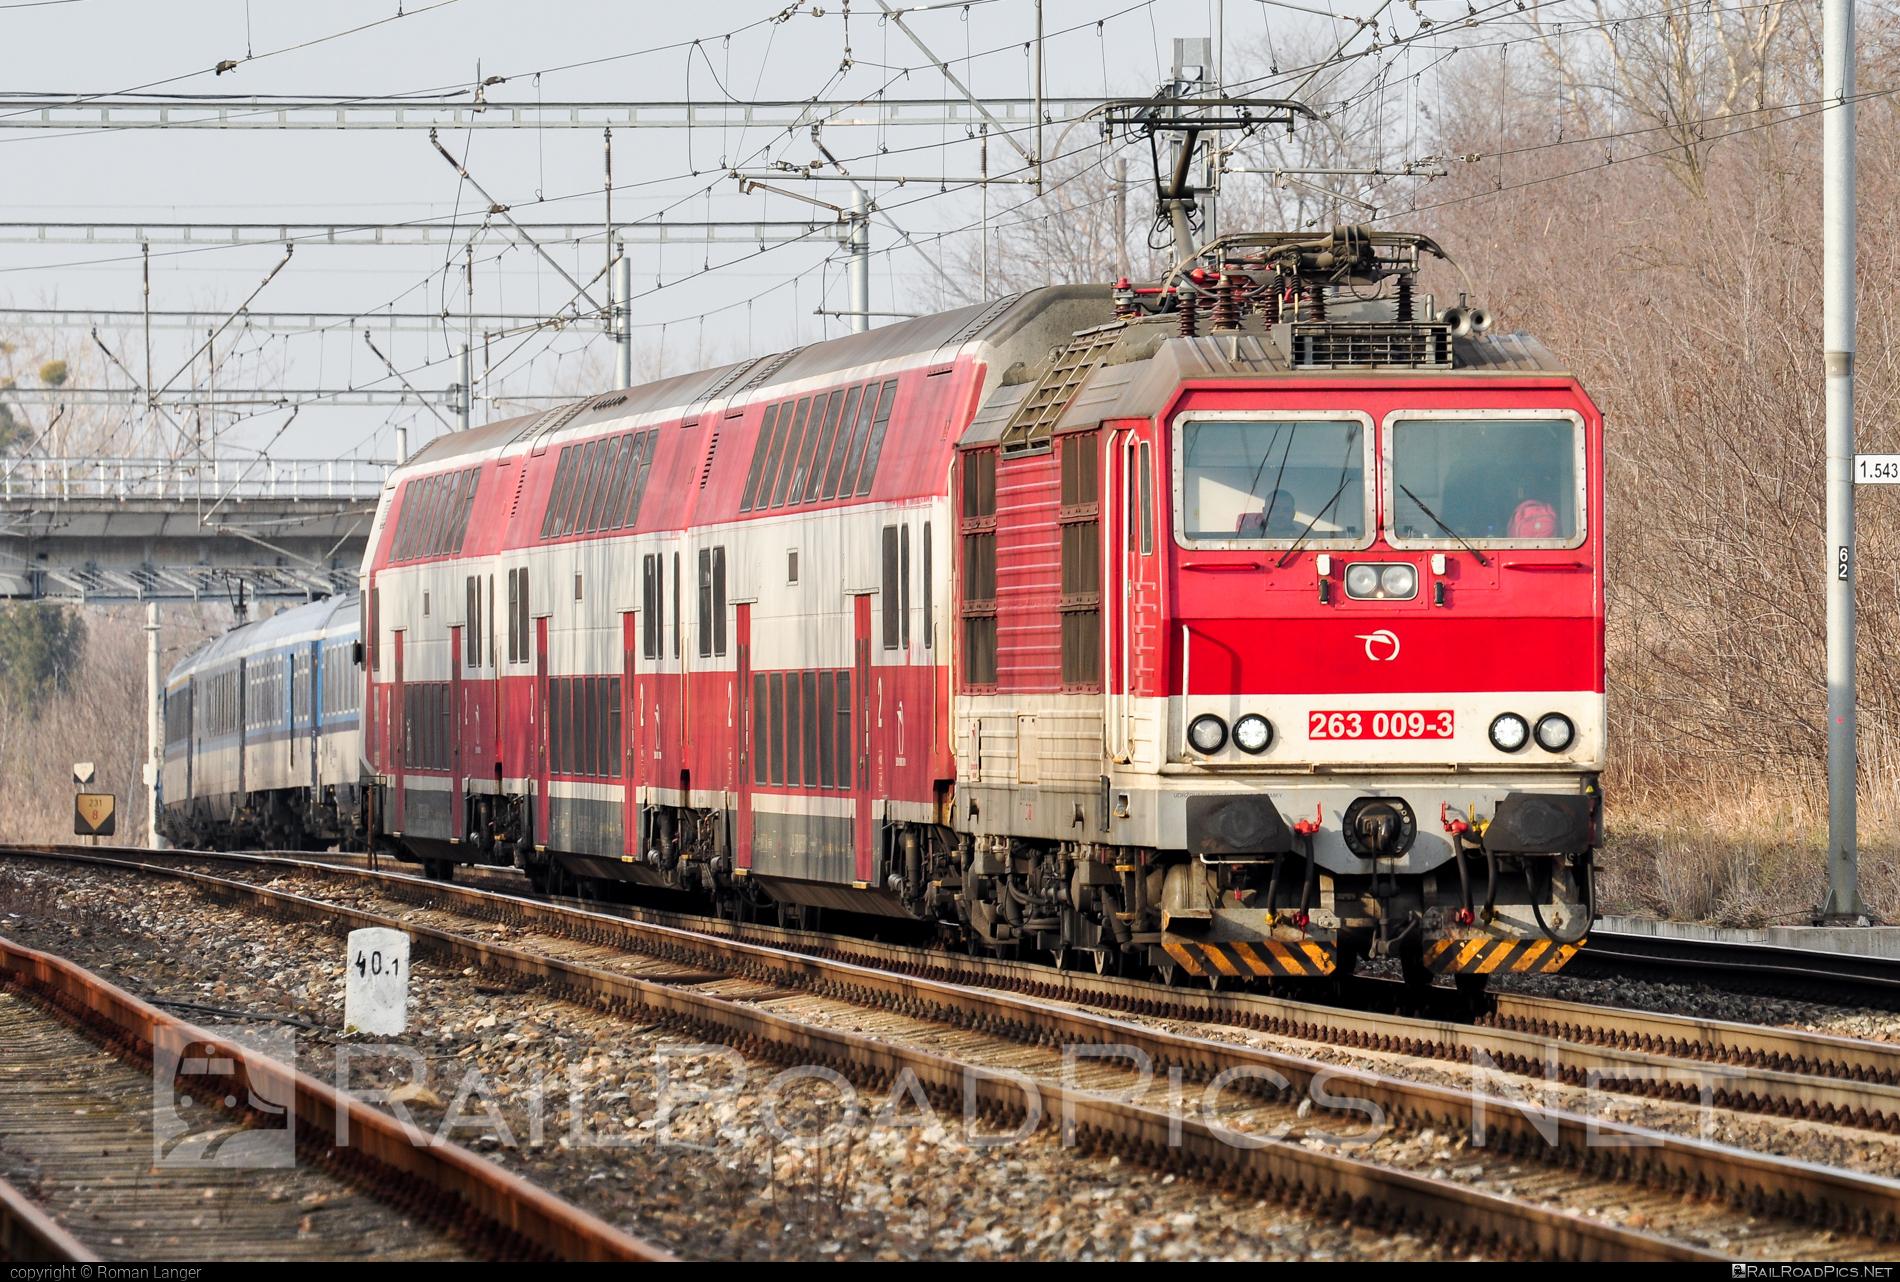 Škoda 70E - 263 009-3 operated by Železničná Spoločnost' Slovensko, a.s. #ZeleznicnaSpolocnostSlovensko #locomotive263 #princezna #skoda #skoda70e #zssk